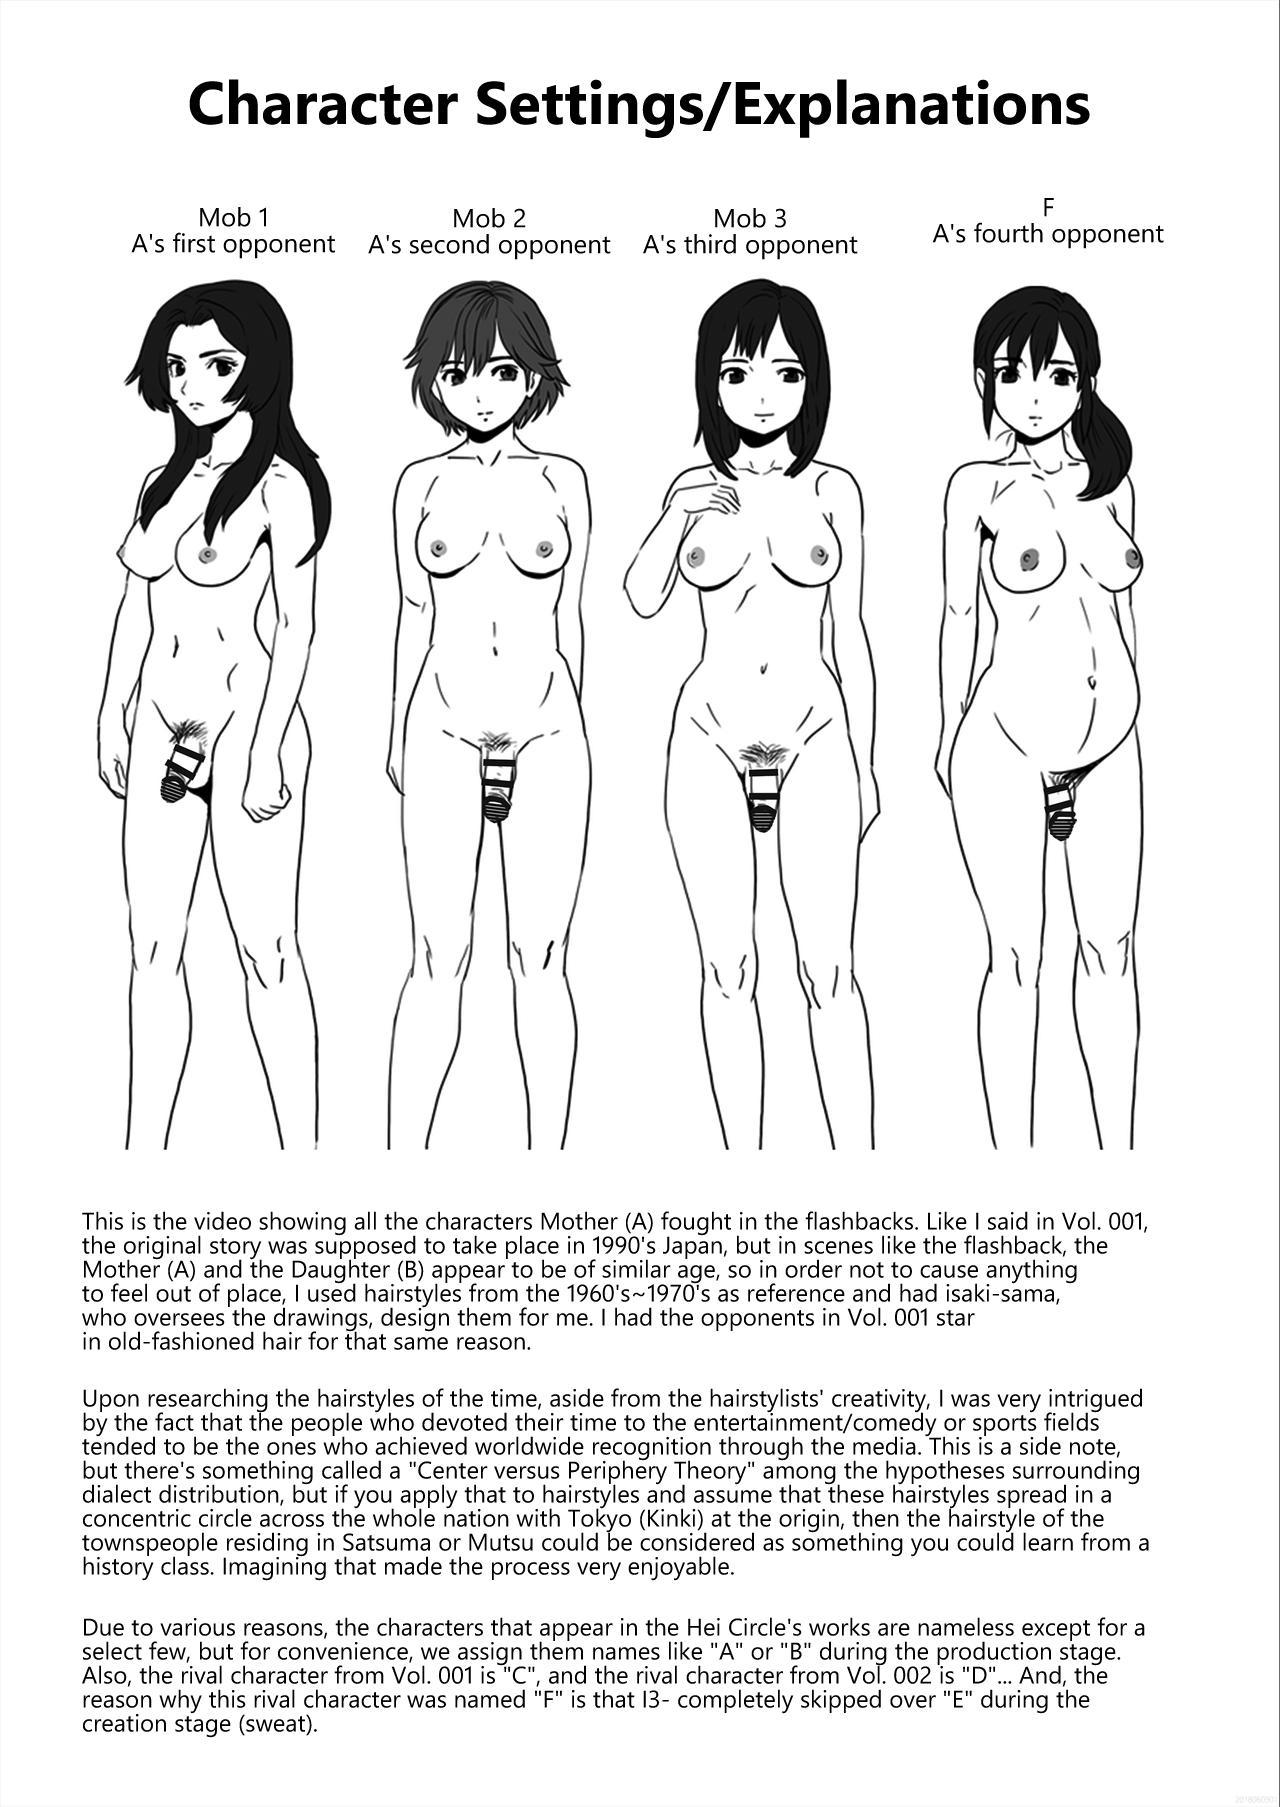 [Remora Works (isaki)] FUTACOLO CO -INHERITANCE- VOL. 003 [English] [Digital] {Hennojin} 23